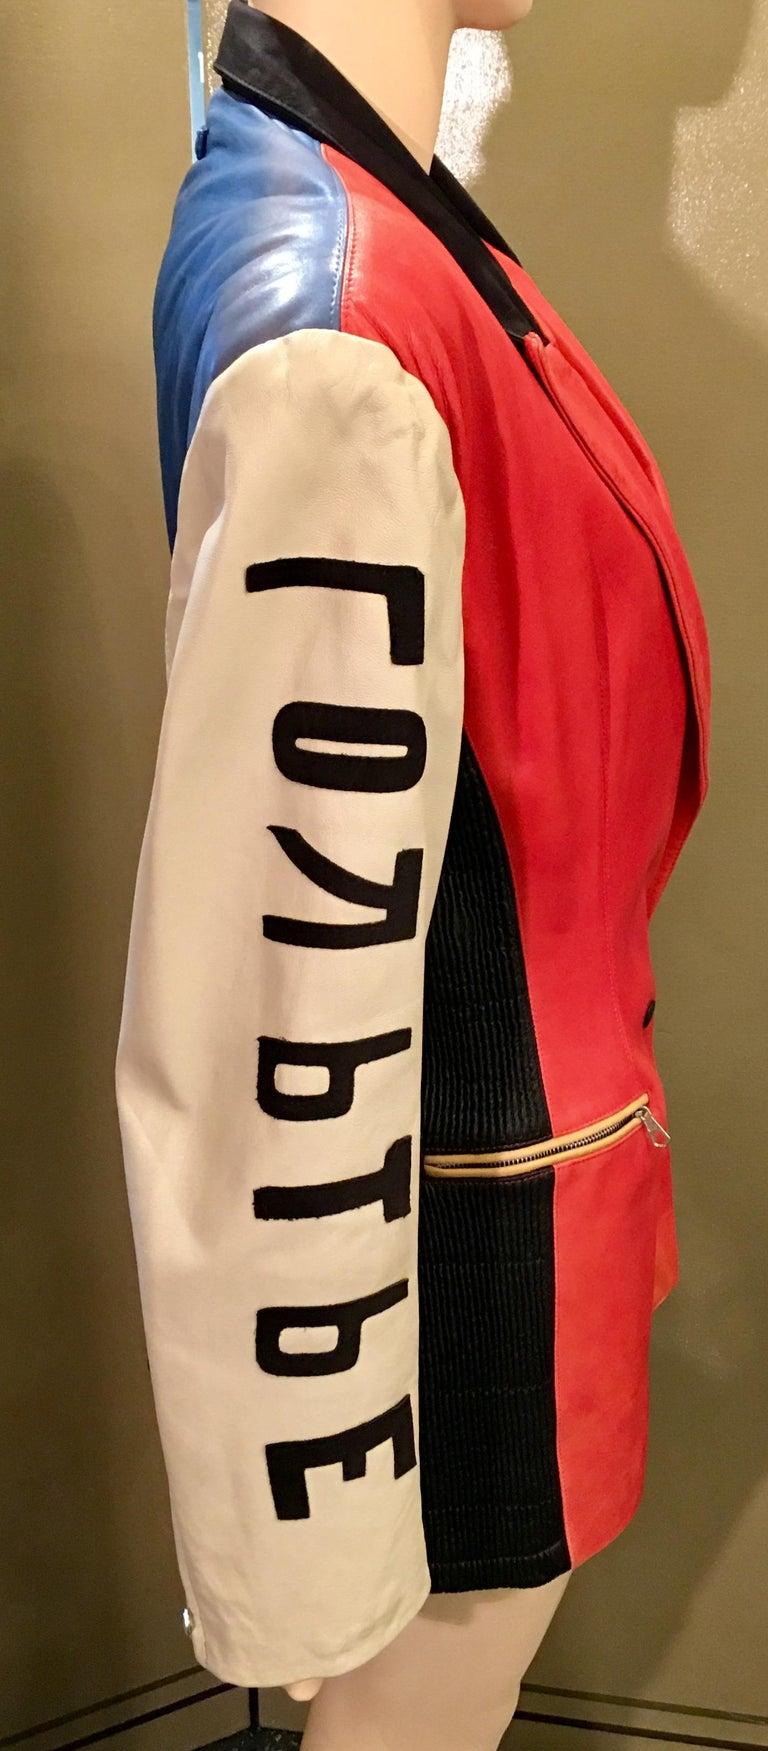 "Vintage Jean Paul Gaultier Leather Coat ""Russian Constructivist"" Collection 1986 For Sale 4"